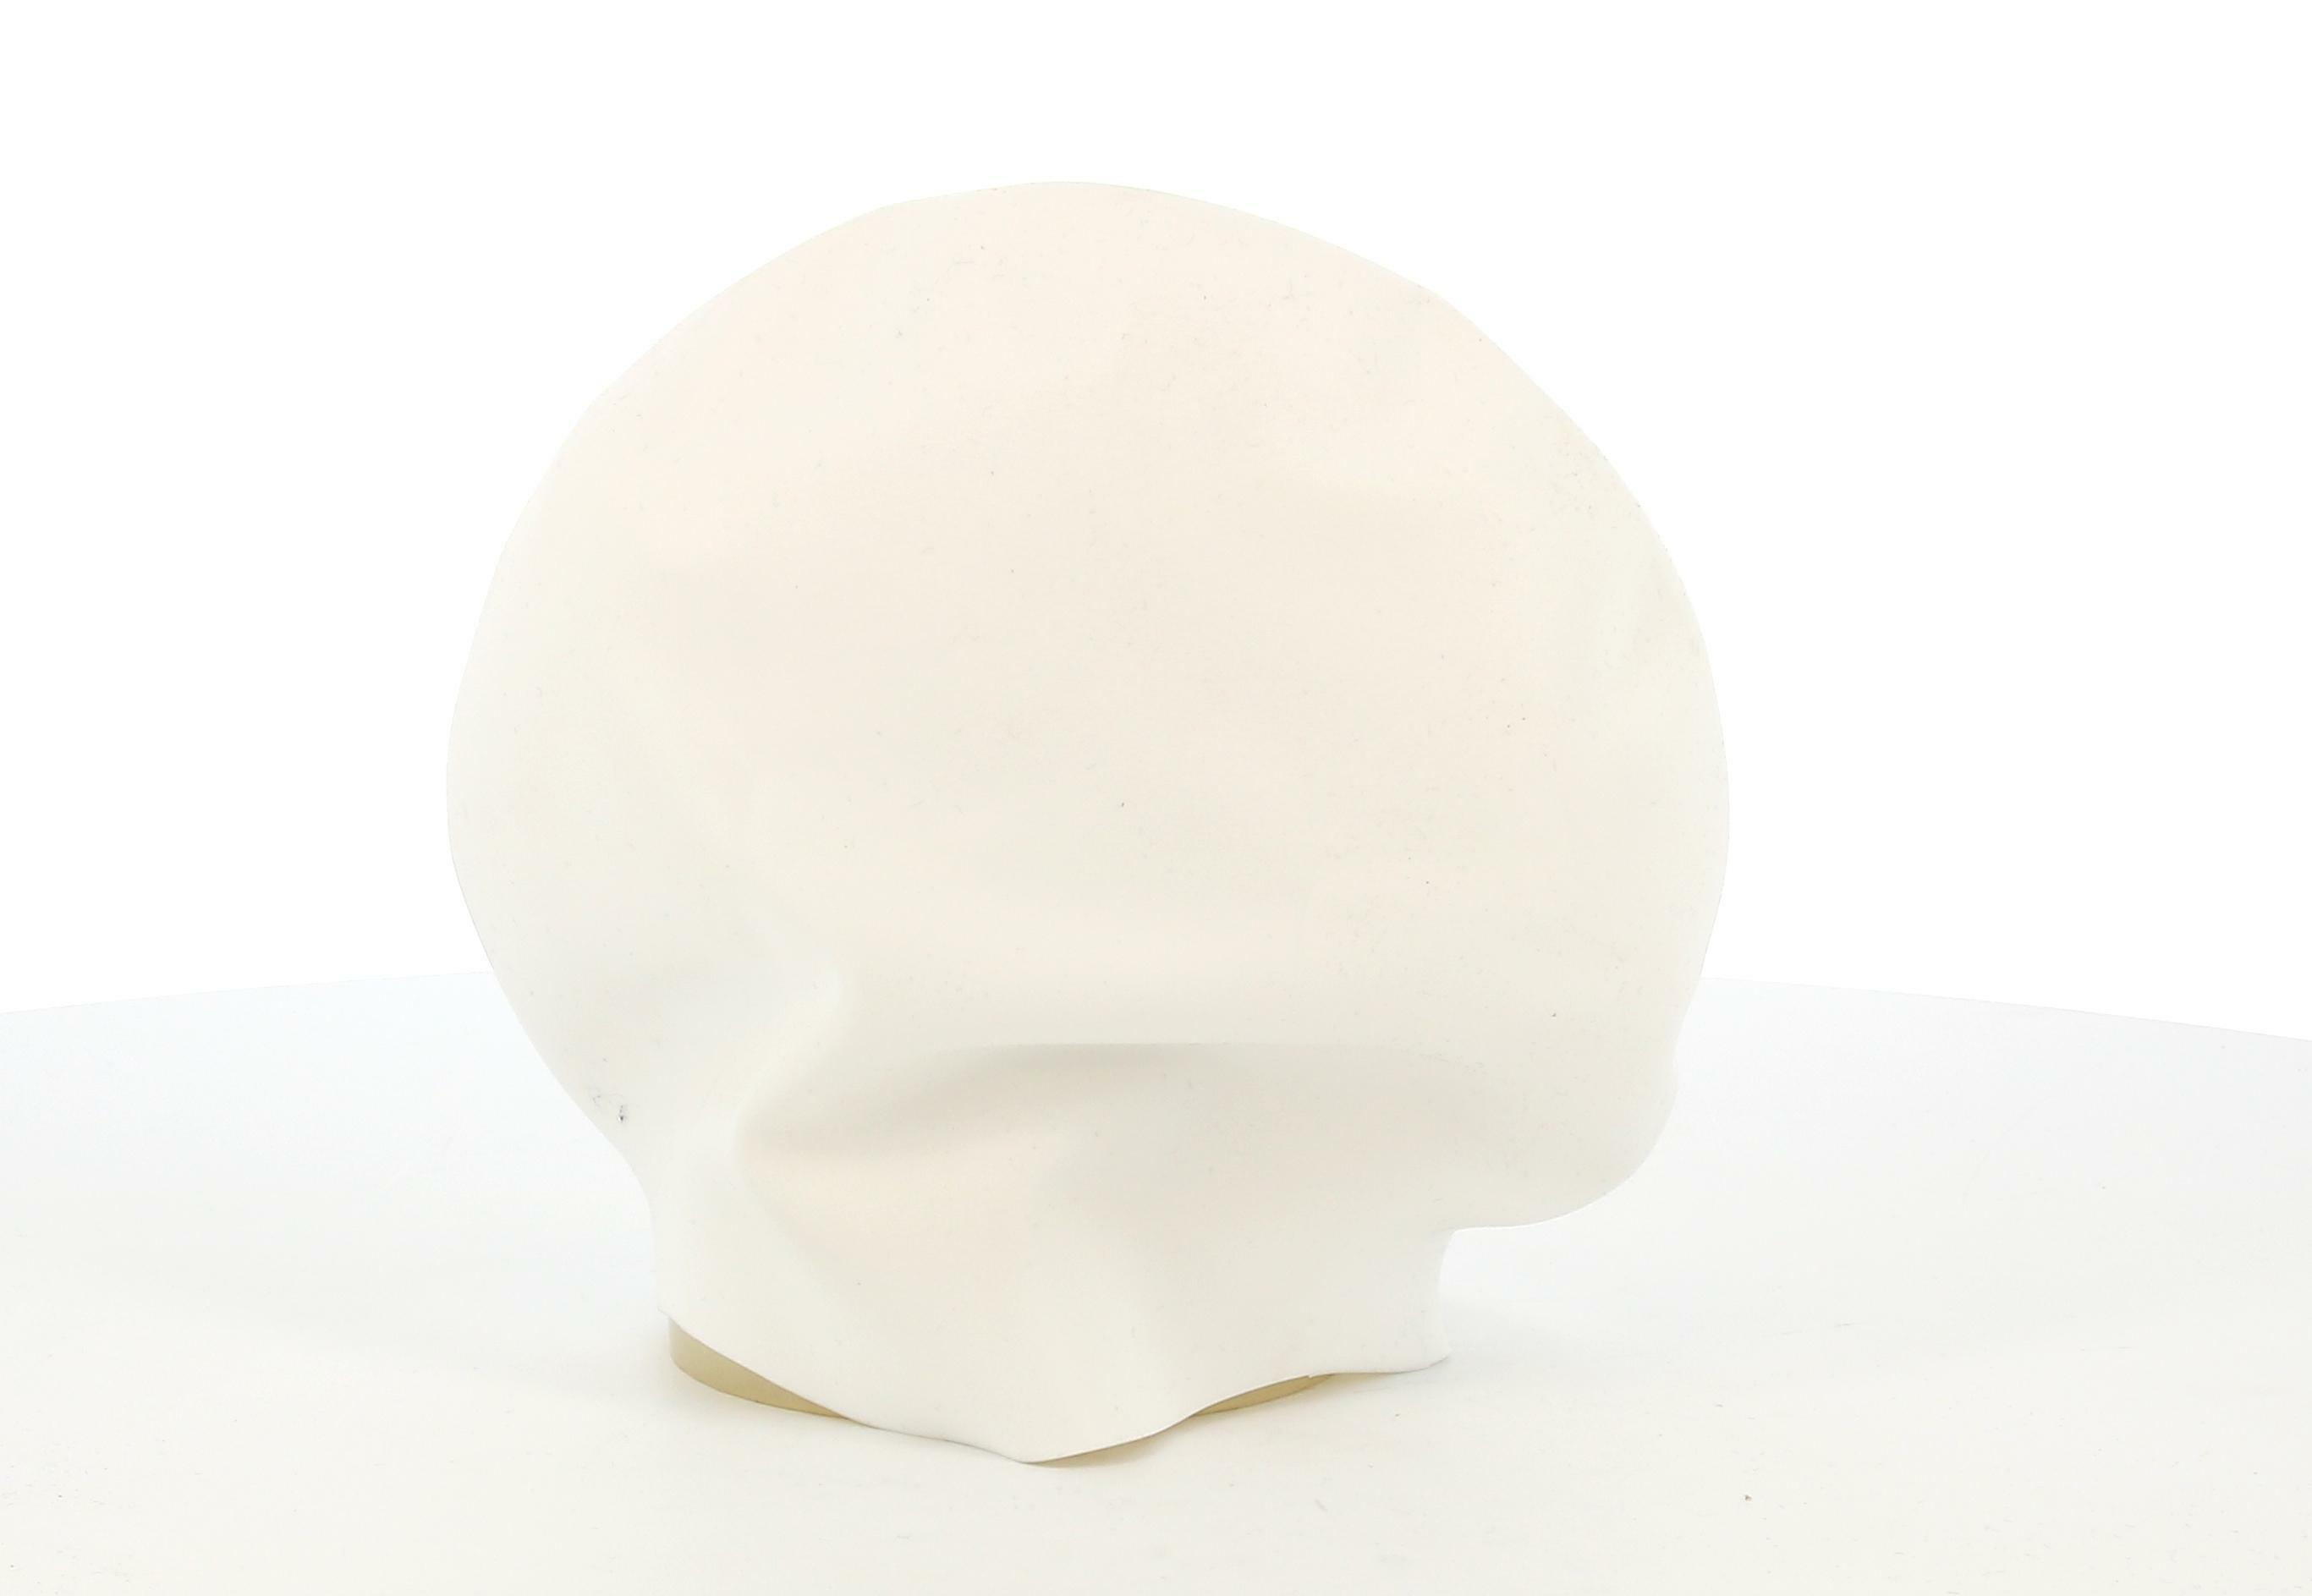 adidas adidas sil cap logo berretto unisex adulto fj4965 cuffia